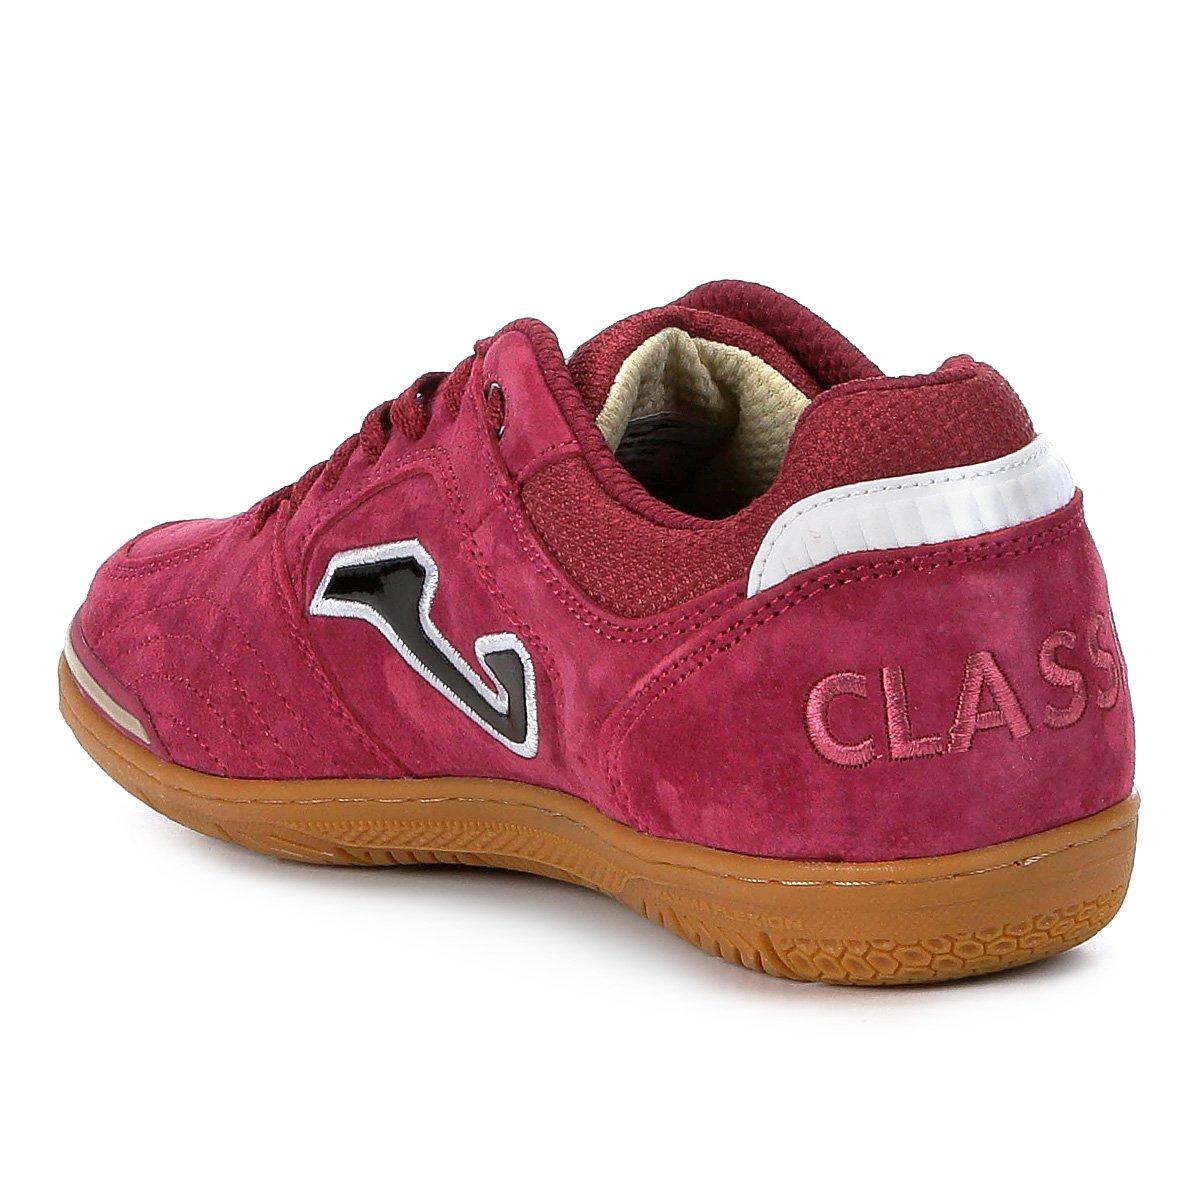 Chuteira Futsal Joma Classic Nobuck IN - Vermelho - Compre Agora ... 100fbdac1ff36